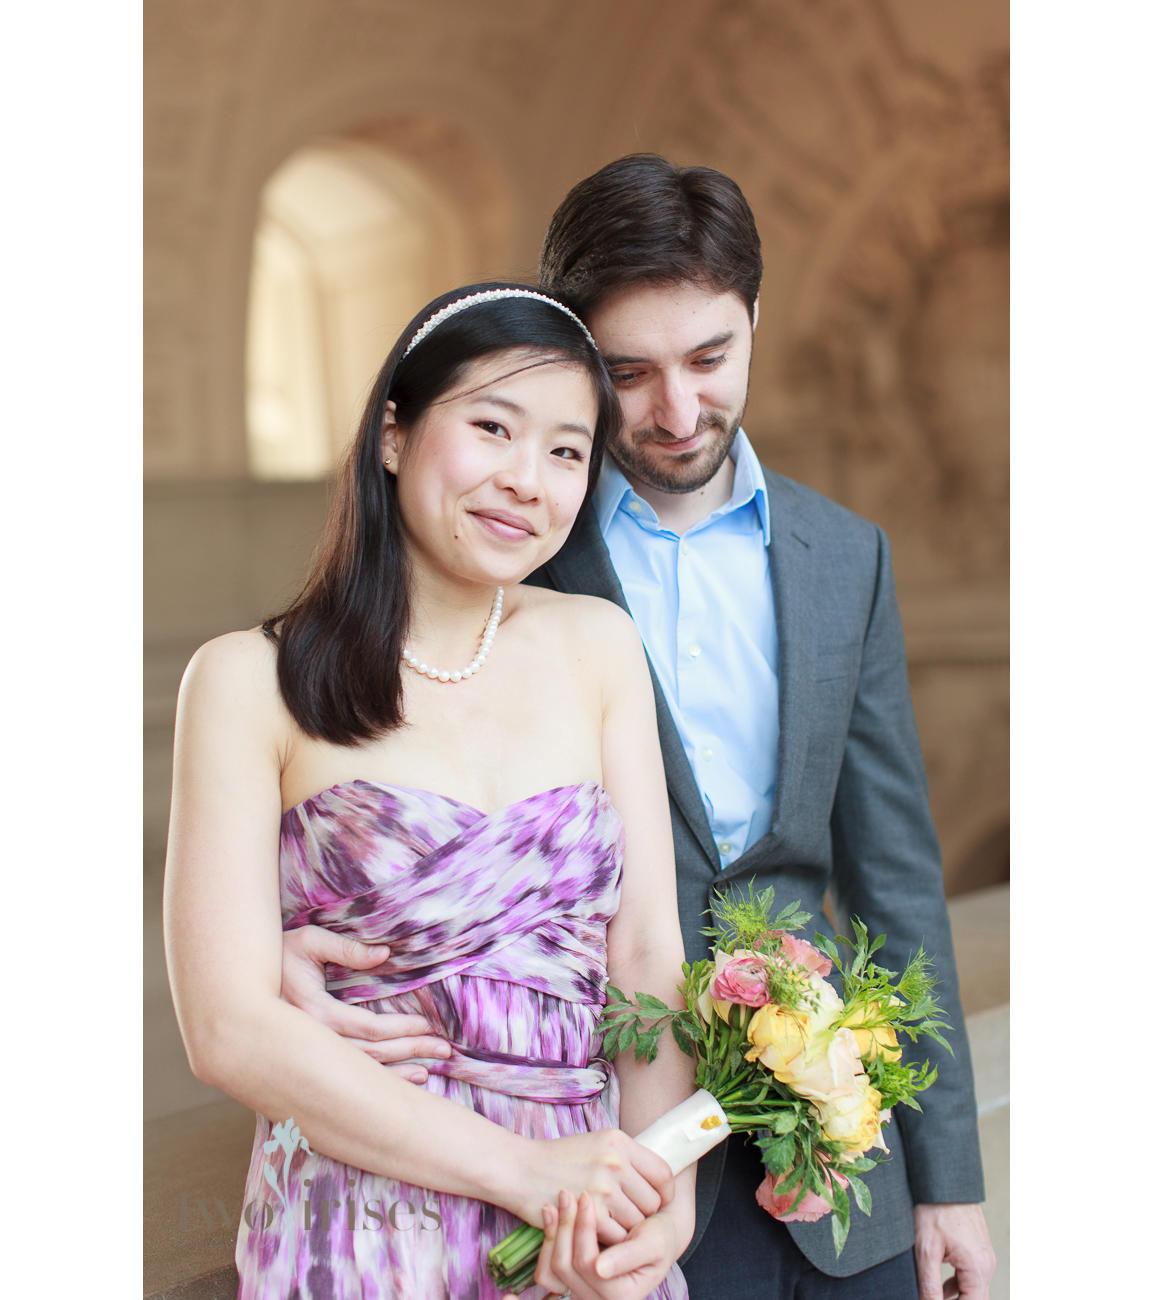 Sf City Hall Wedding Photo by Two Irises